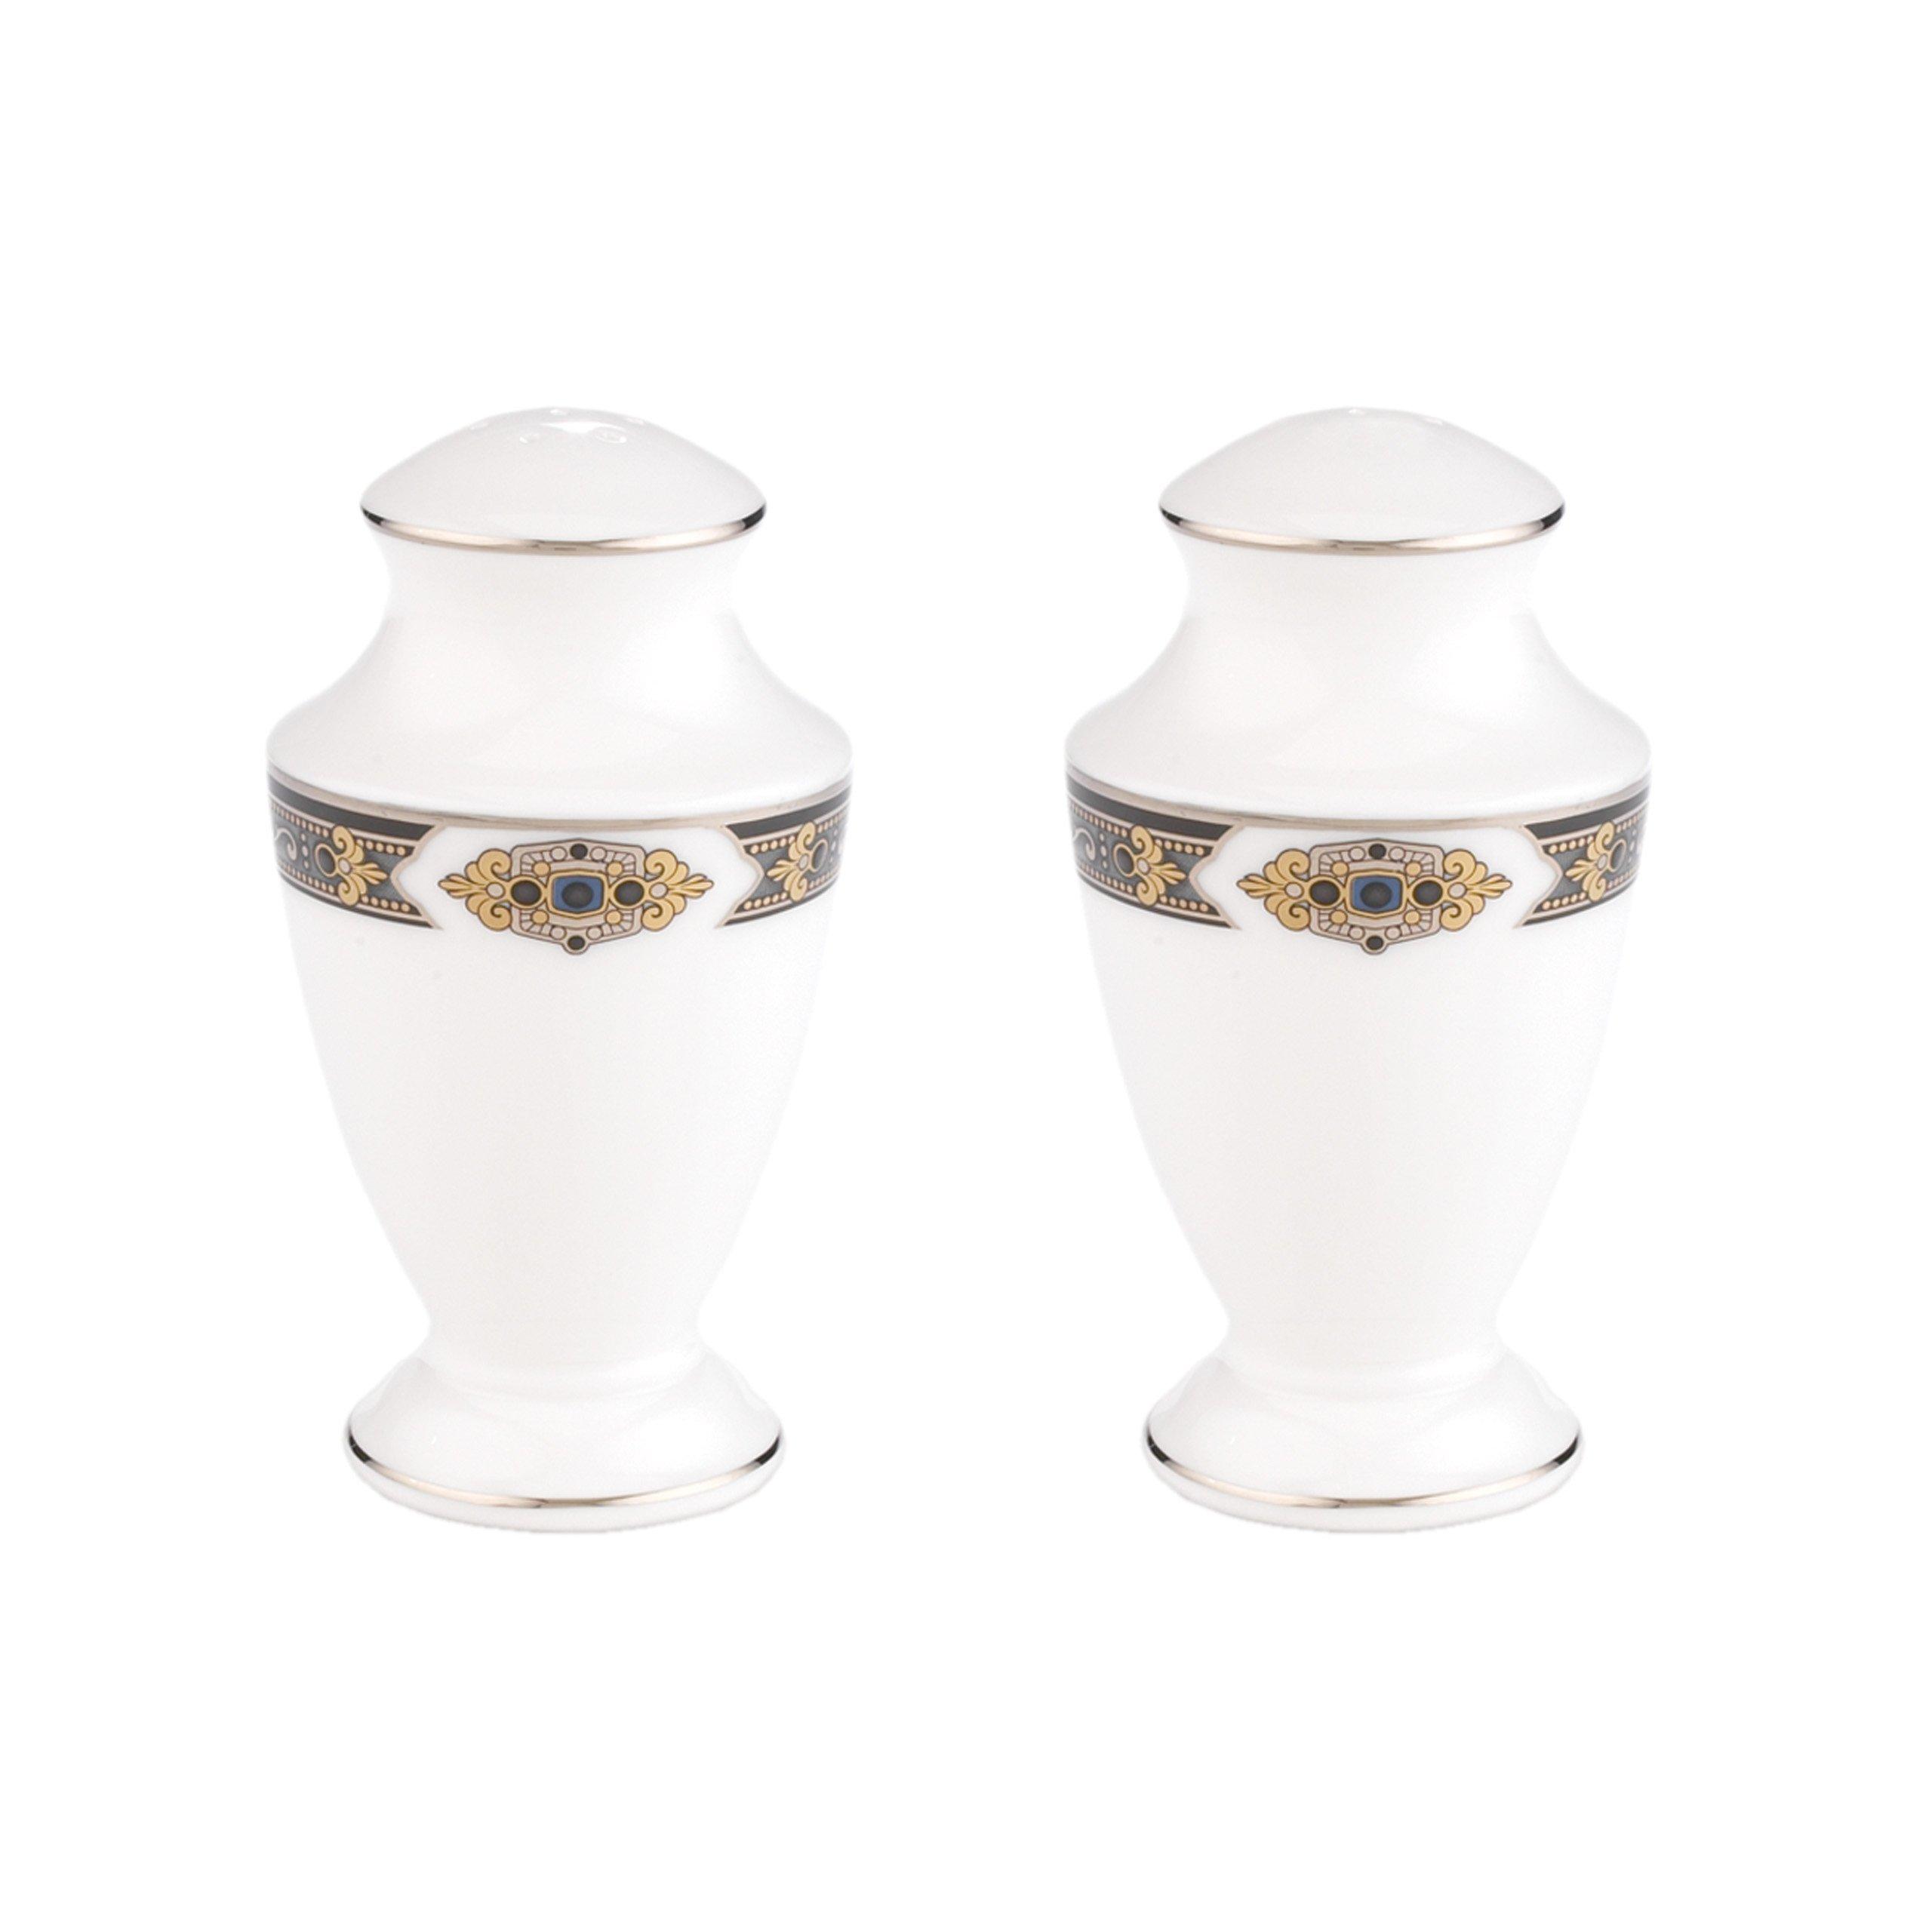 Lenox Vintage Jewel Salt and Pepper Set, White